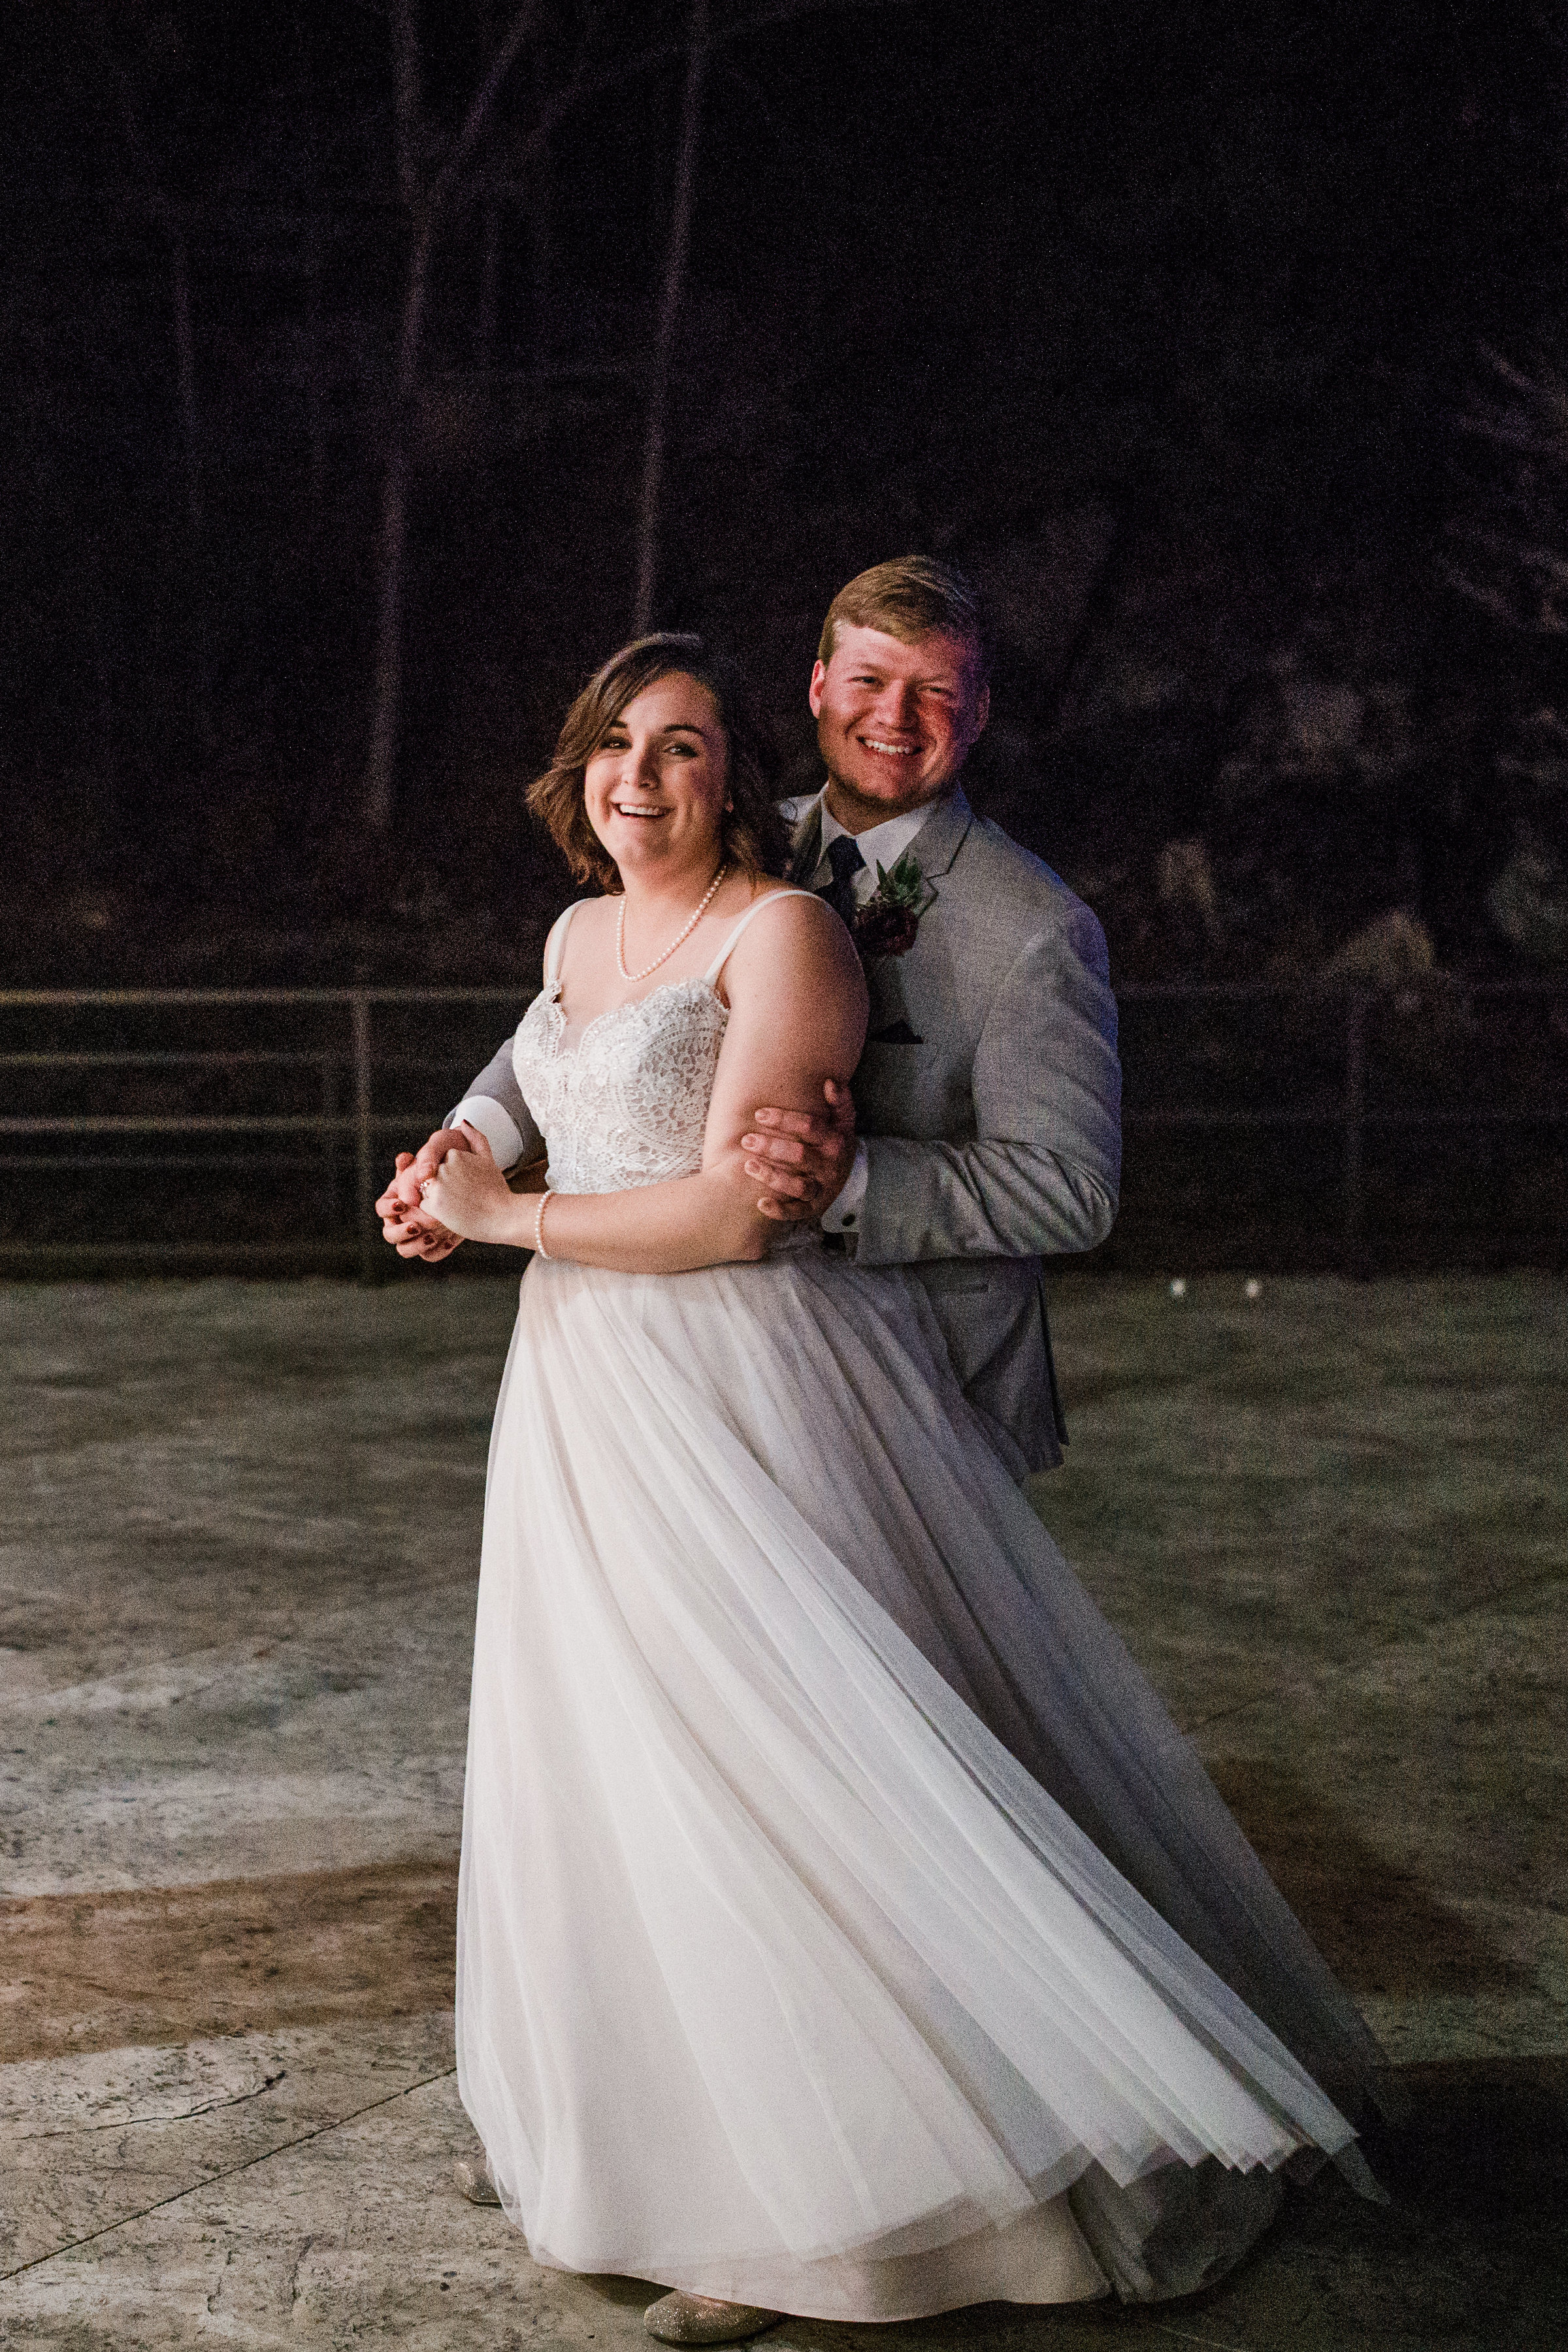 Graystone-Quarry-Wedding 82.jpg